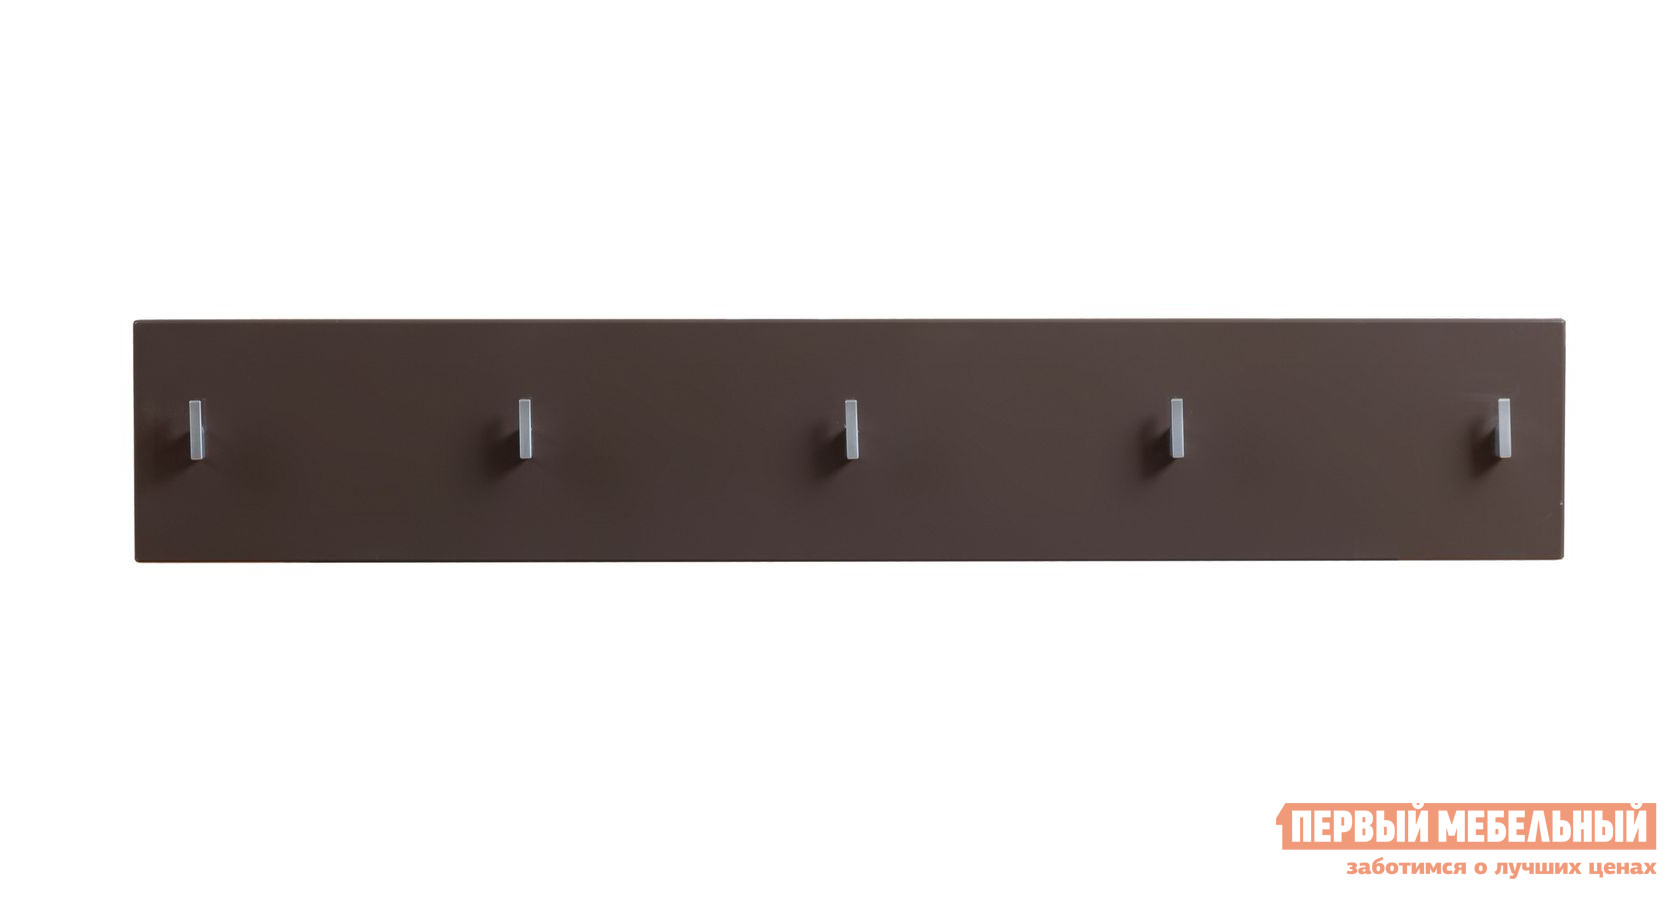 Настенная вешалка Первый Мебельный Хоумлайн 2 заглушка на шур pz2 khs 3 5 кор 100шт